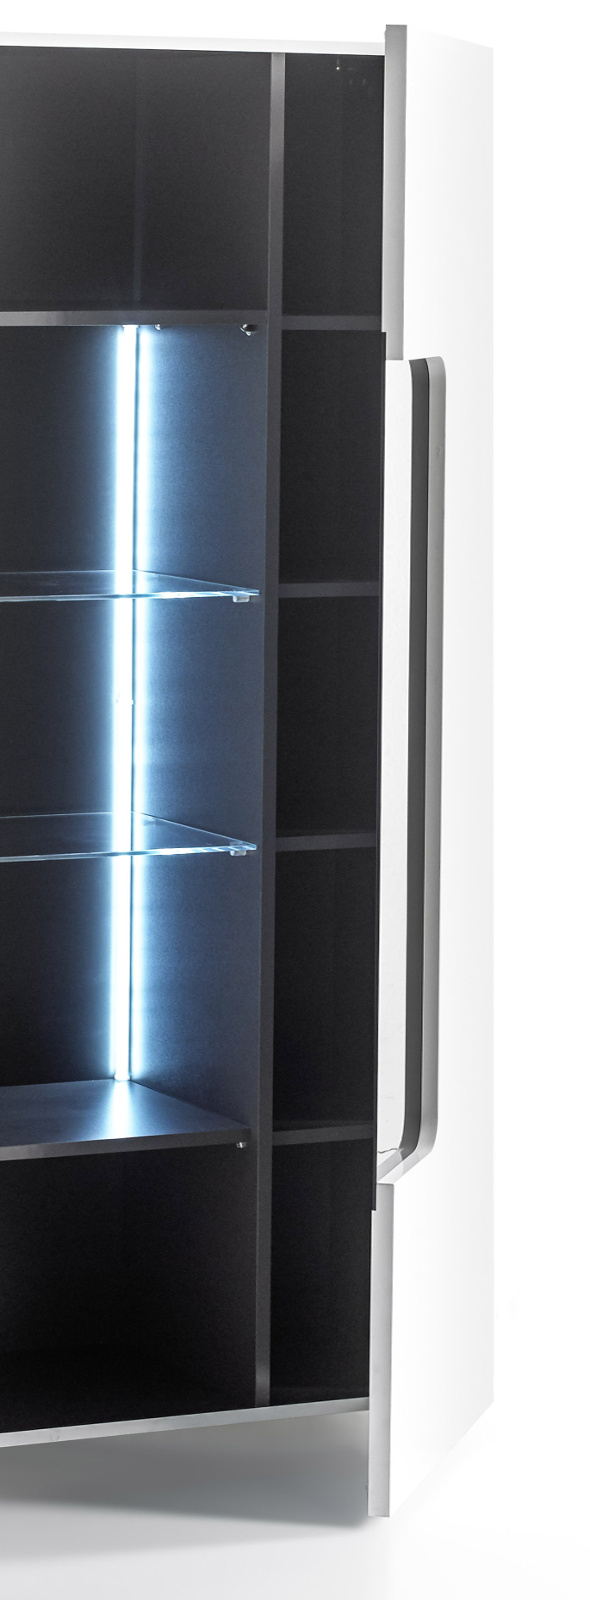 vitrine vicenza hochglanz wei lack 51 cm. Black Bedroom Furniture Sets. Home Design Ideas